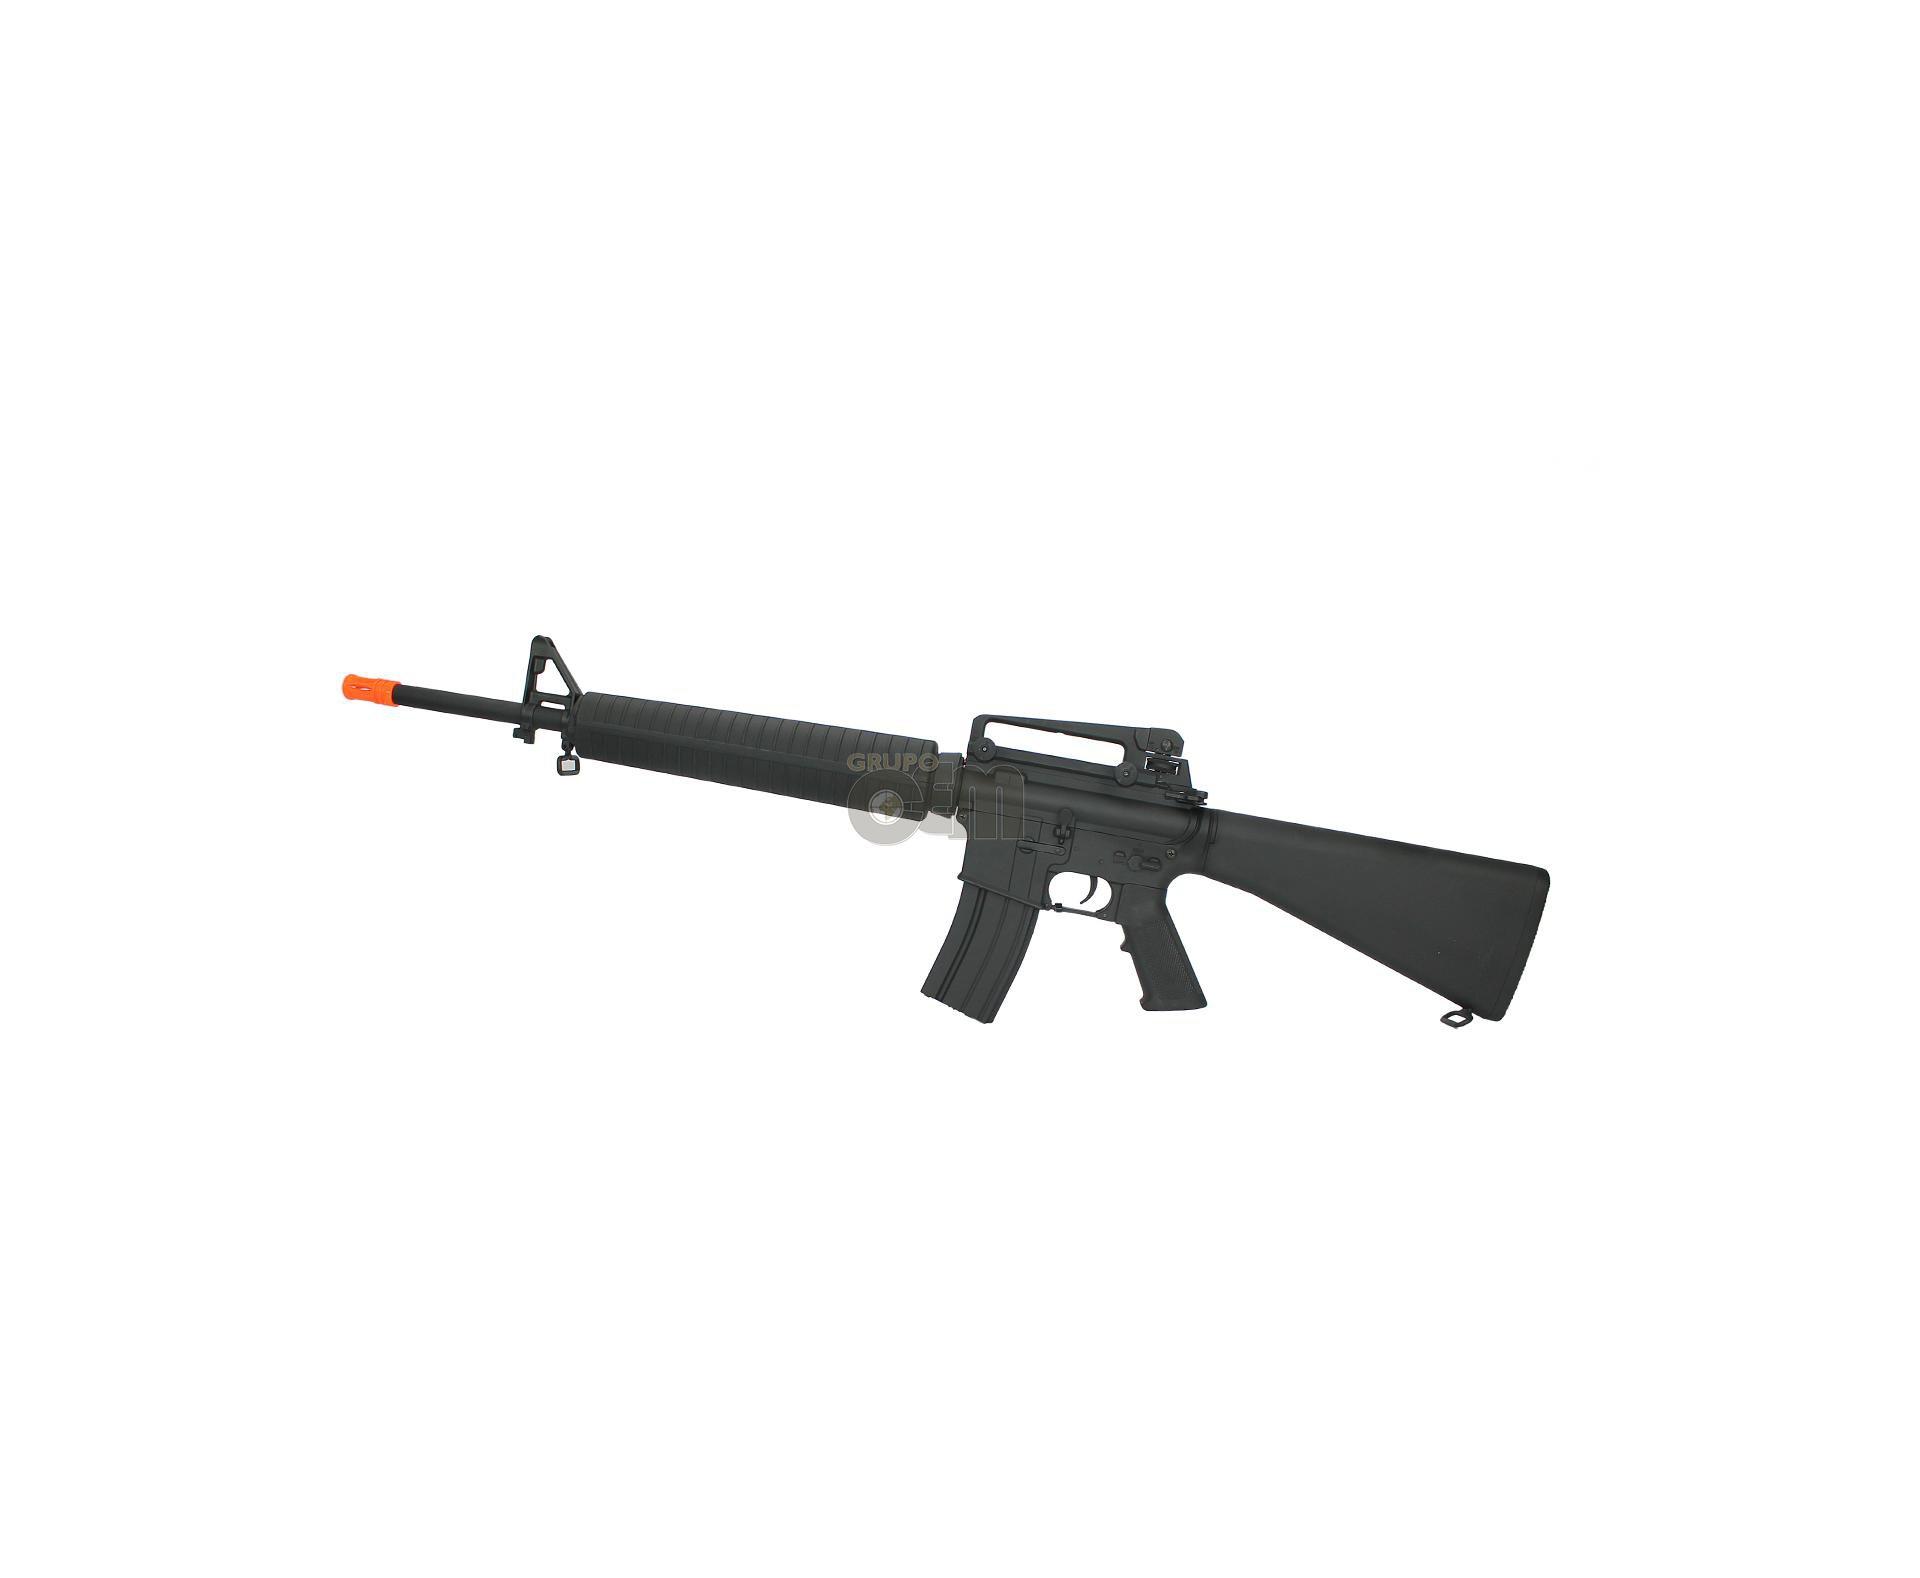 Rifle De Airsoft M16a3 Eletrica - Cal 6mm - Bivolt - Cyma